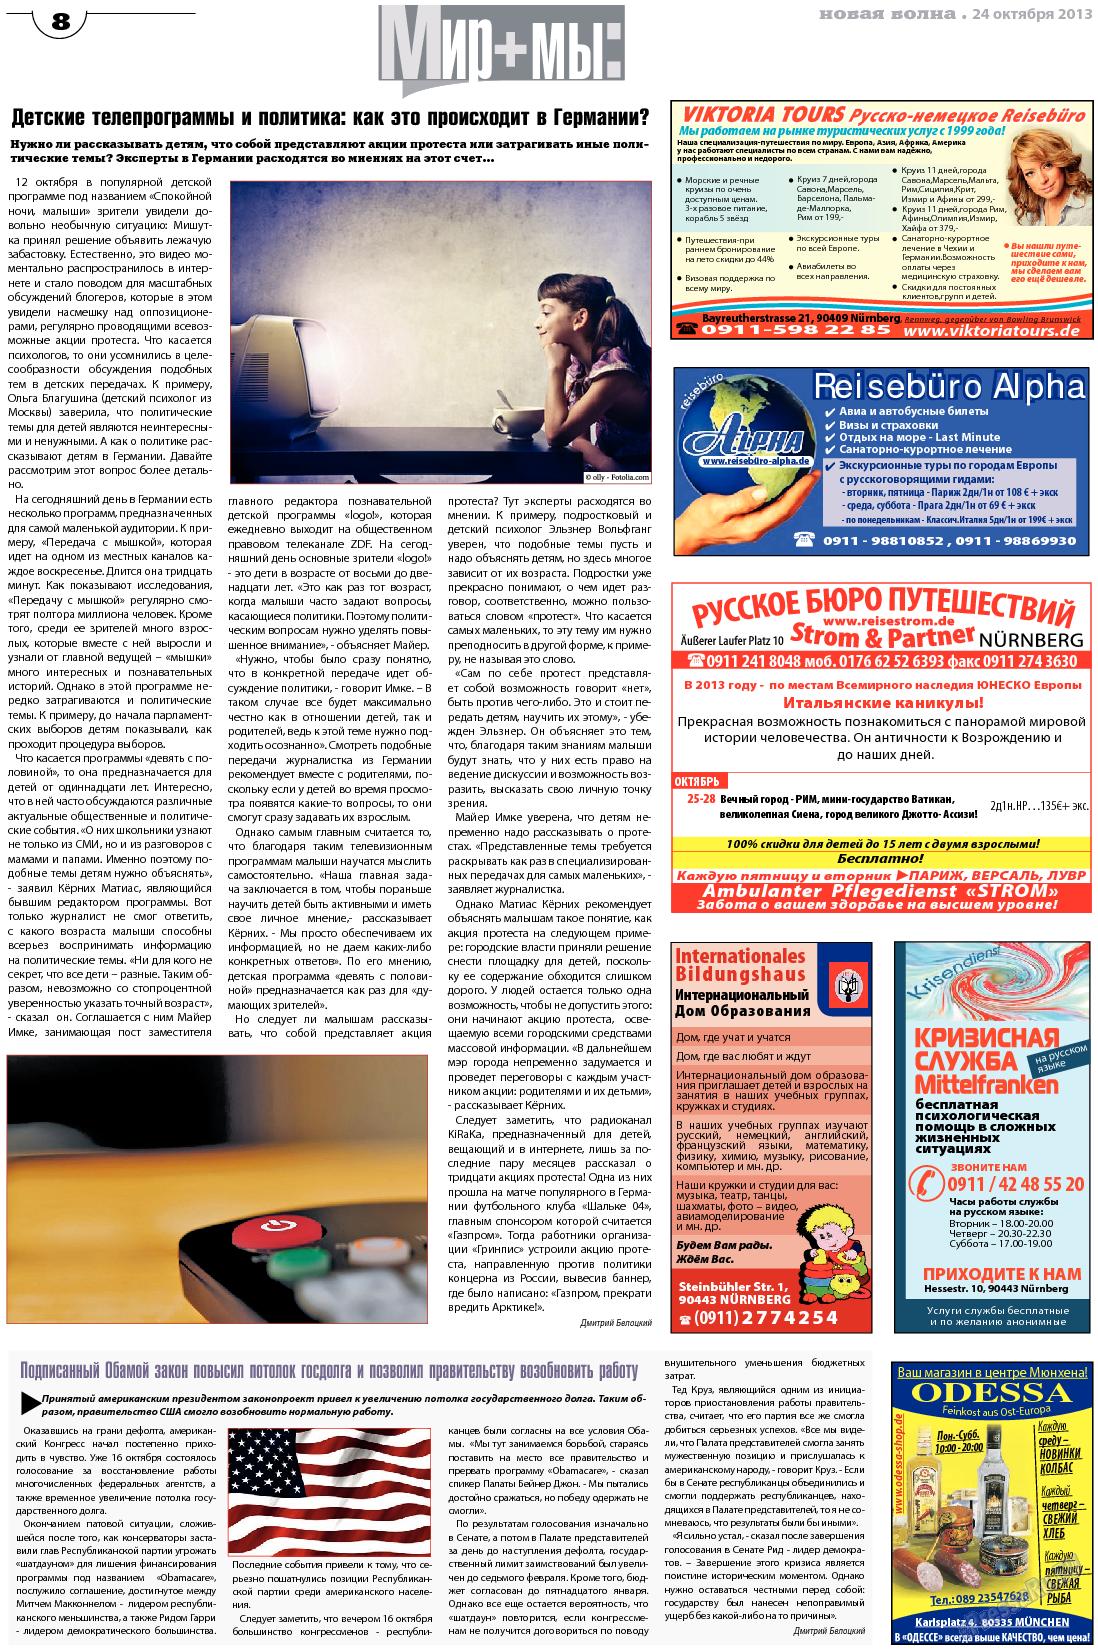 Новая Wолна (газета). 2013 год, номер 43, стр. 8